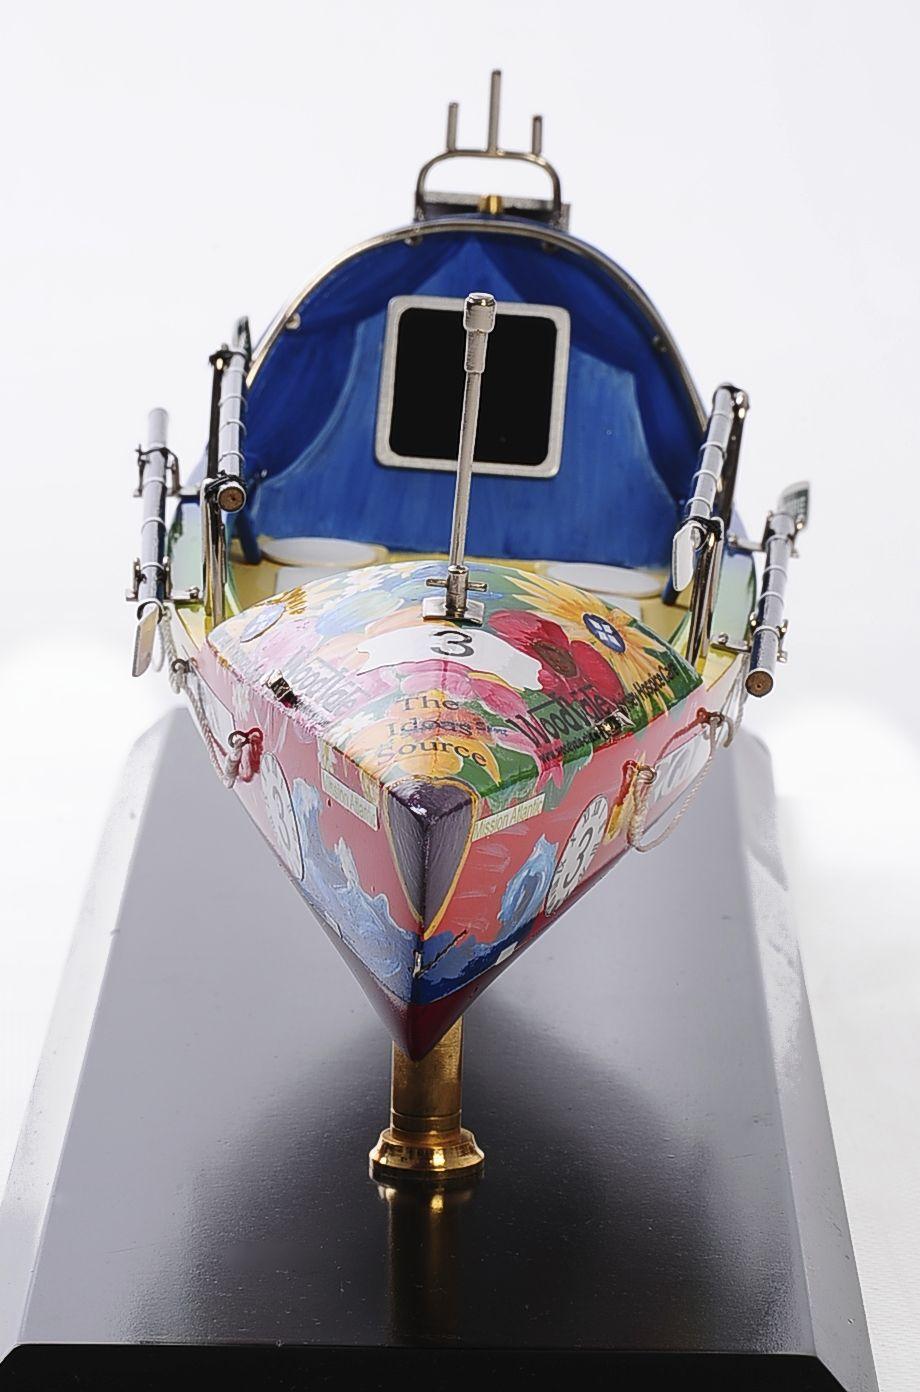 1389-8757-Ocean-Rowing-Boat-Model